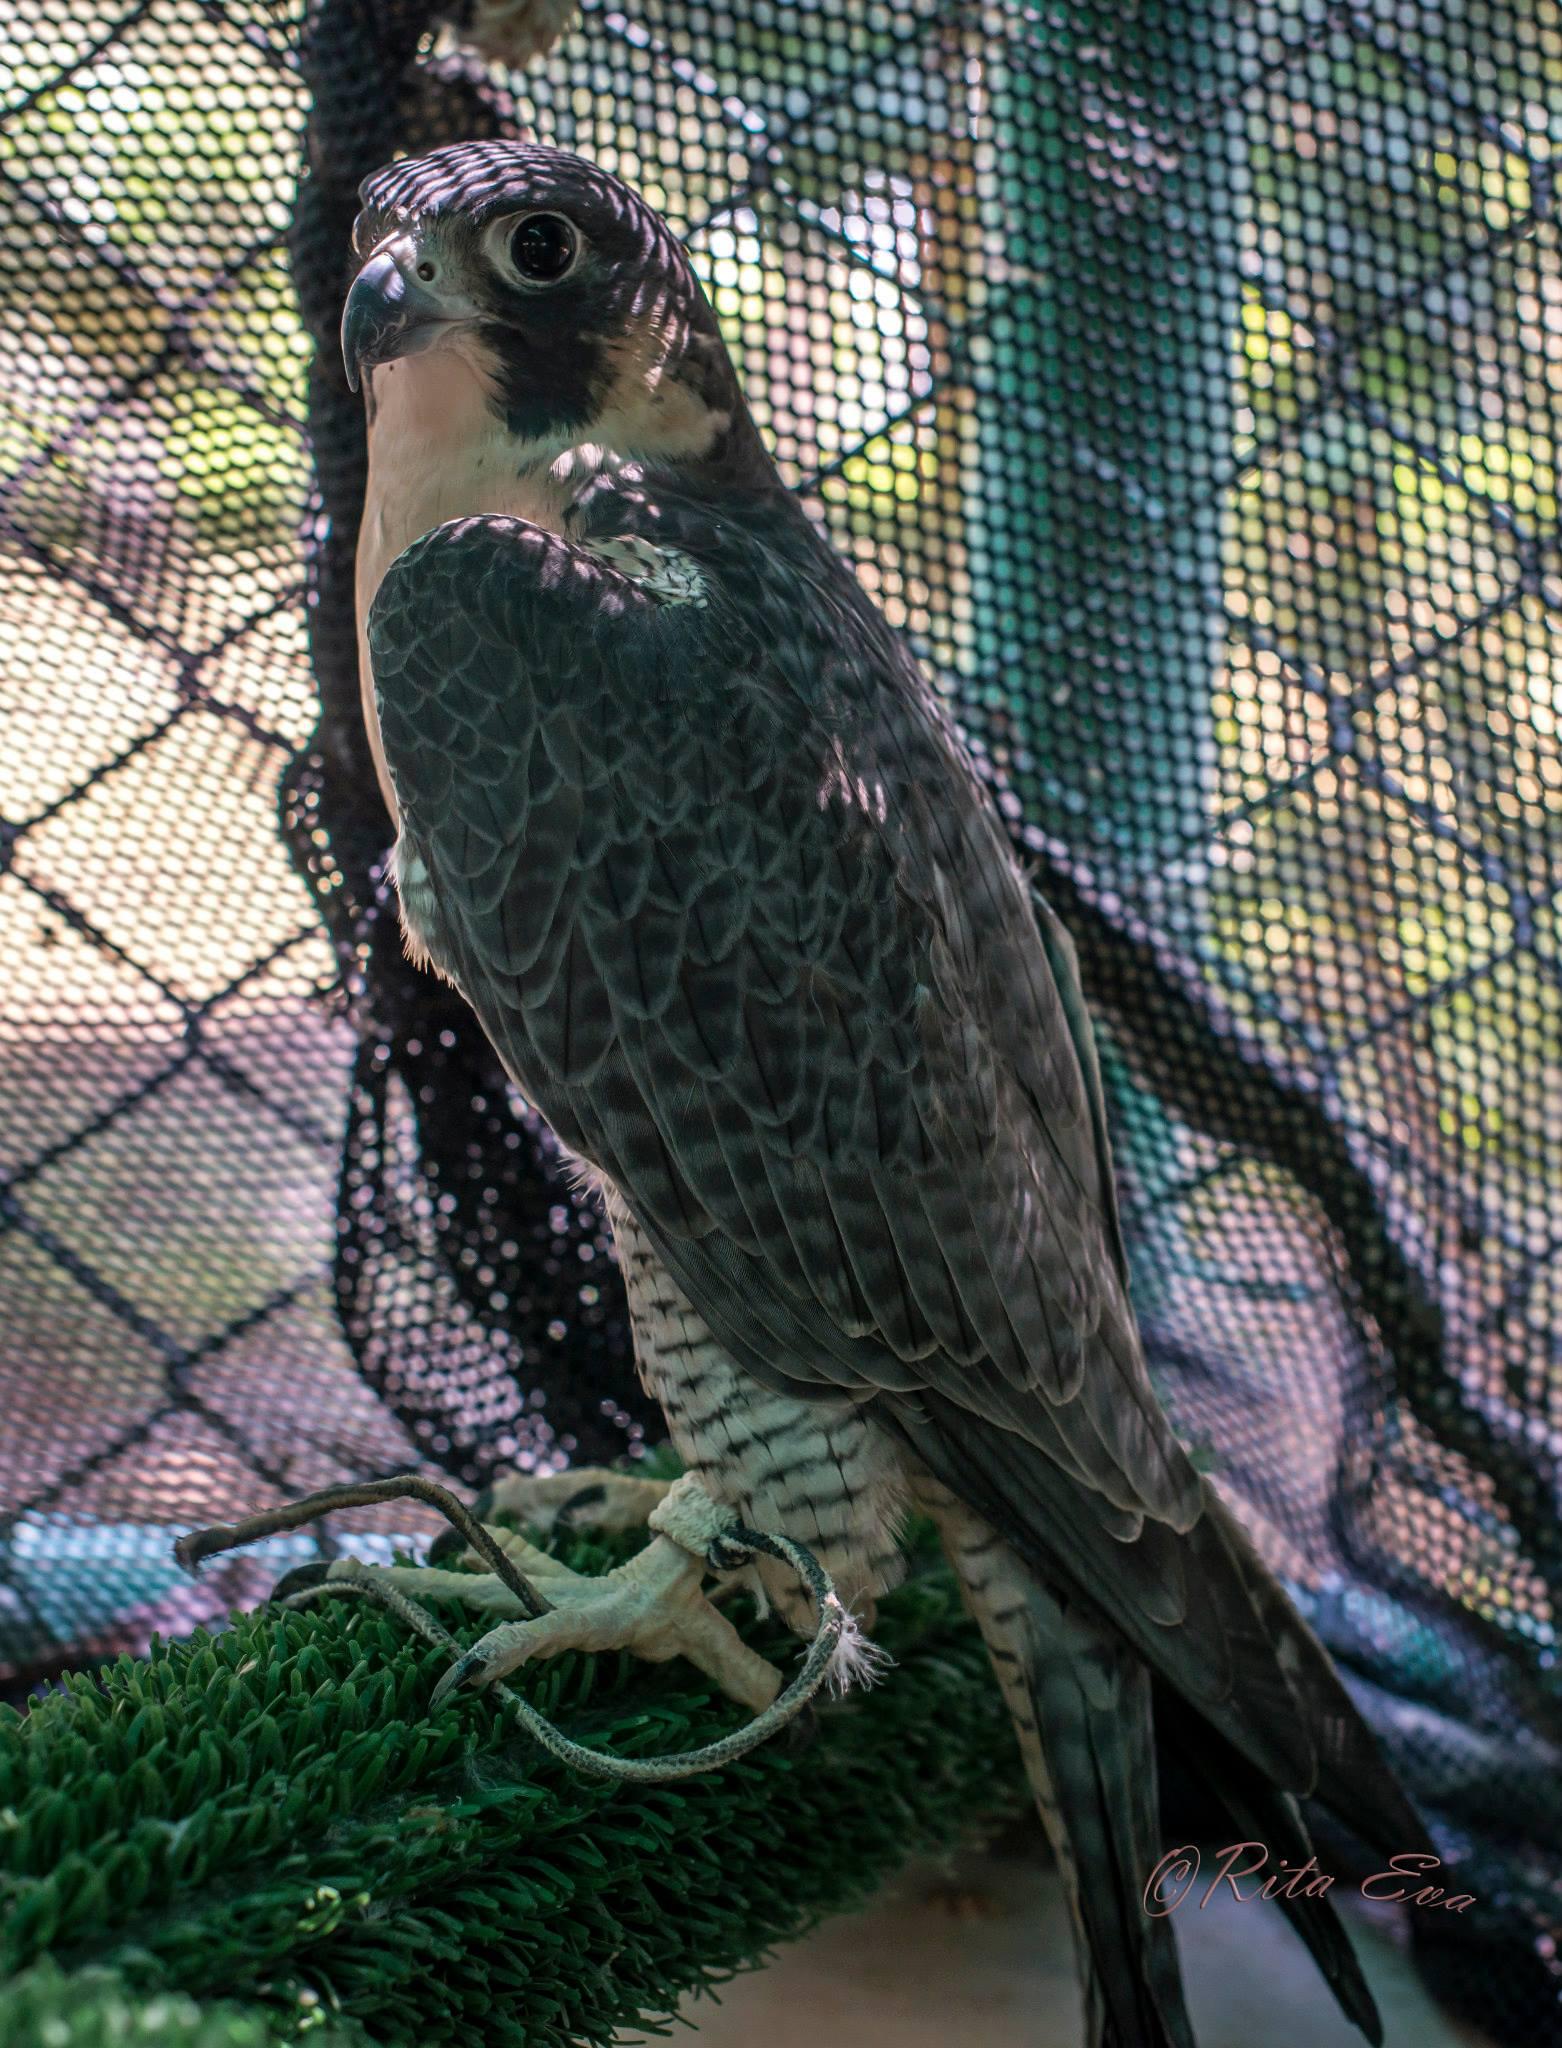 another beautiful bird ~ darker feathers